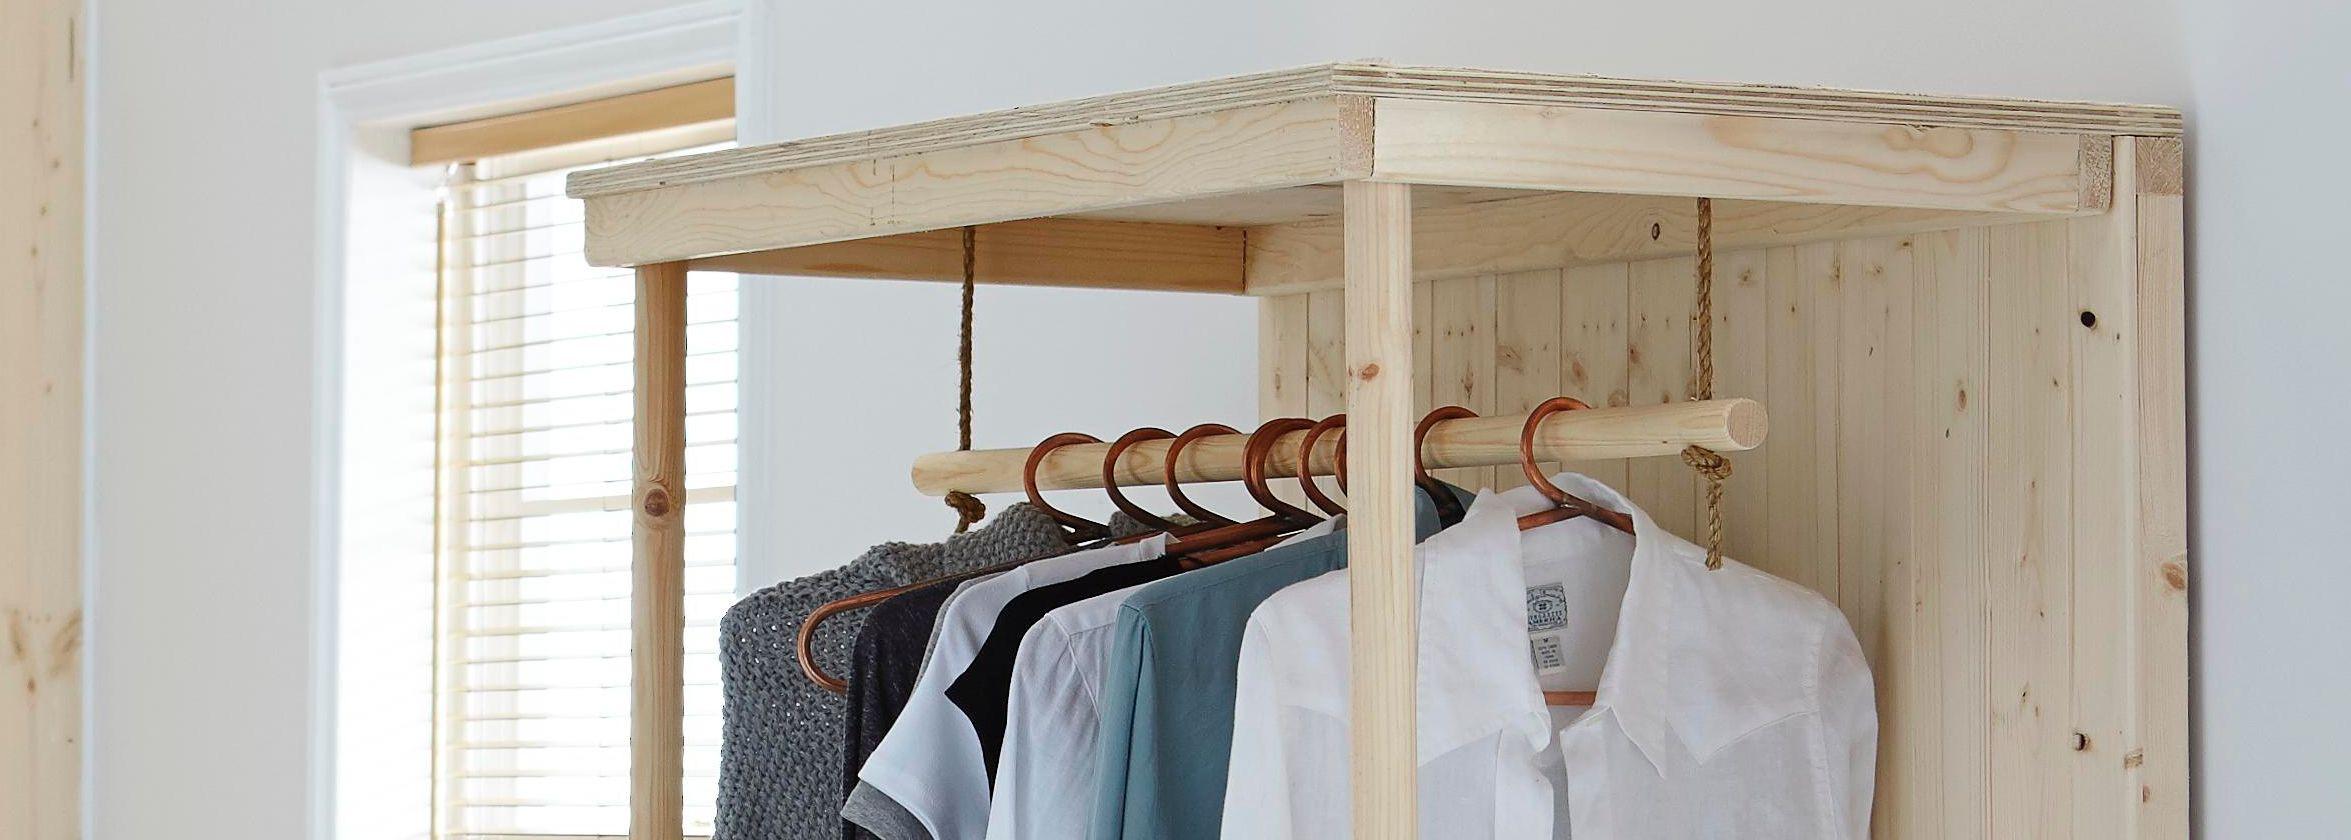 Wardrobe Diy  How to make a wardrobe Help & Ideas